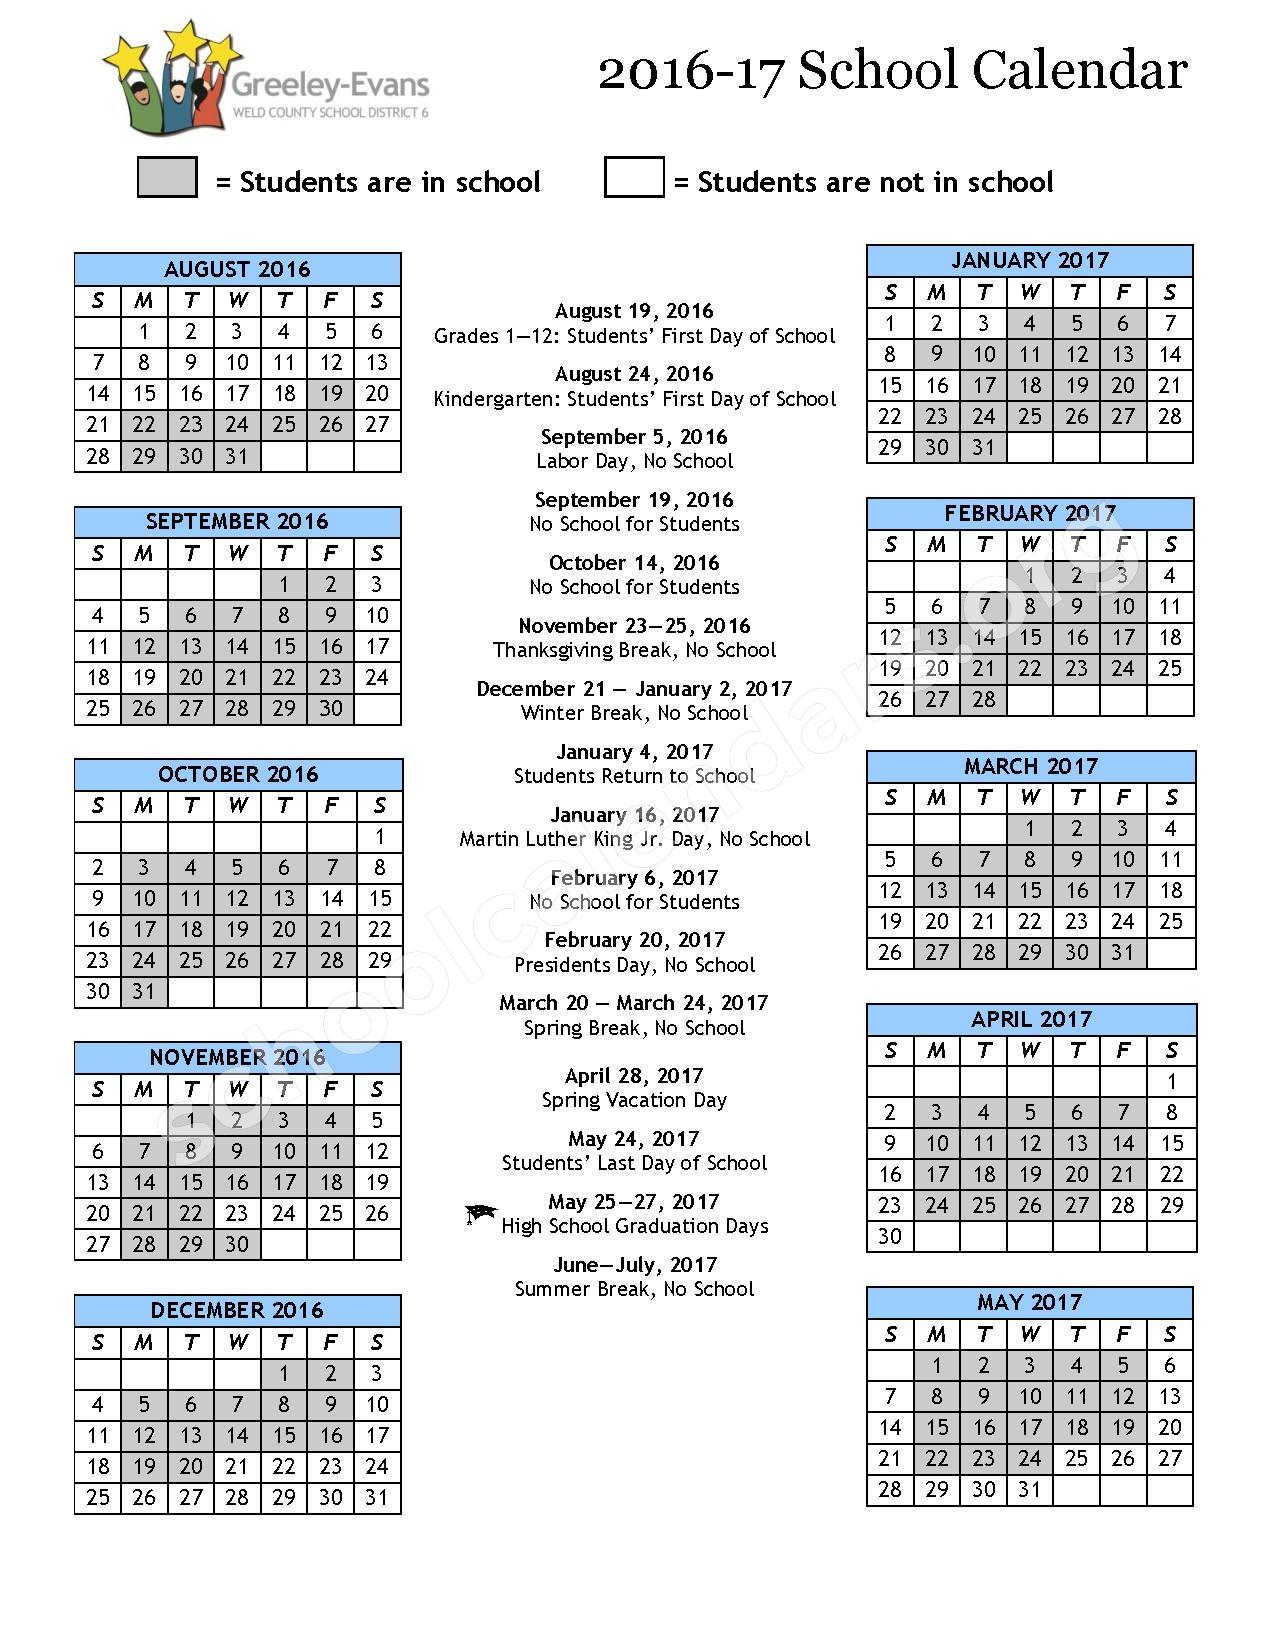 2014 - 2015 School Calendar | Greeley-Evans School District 6 ...